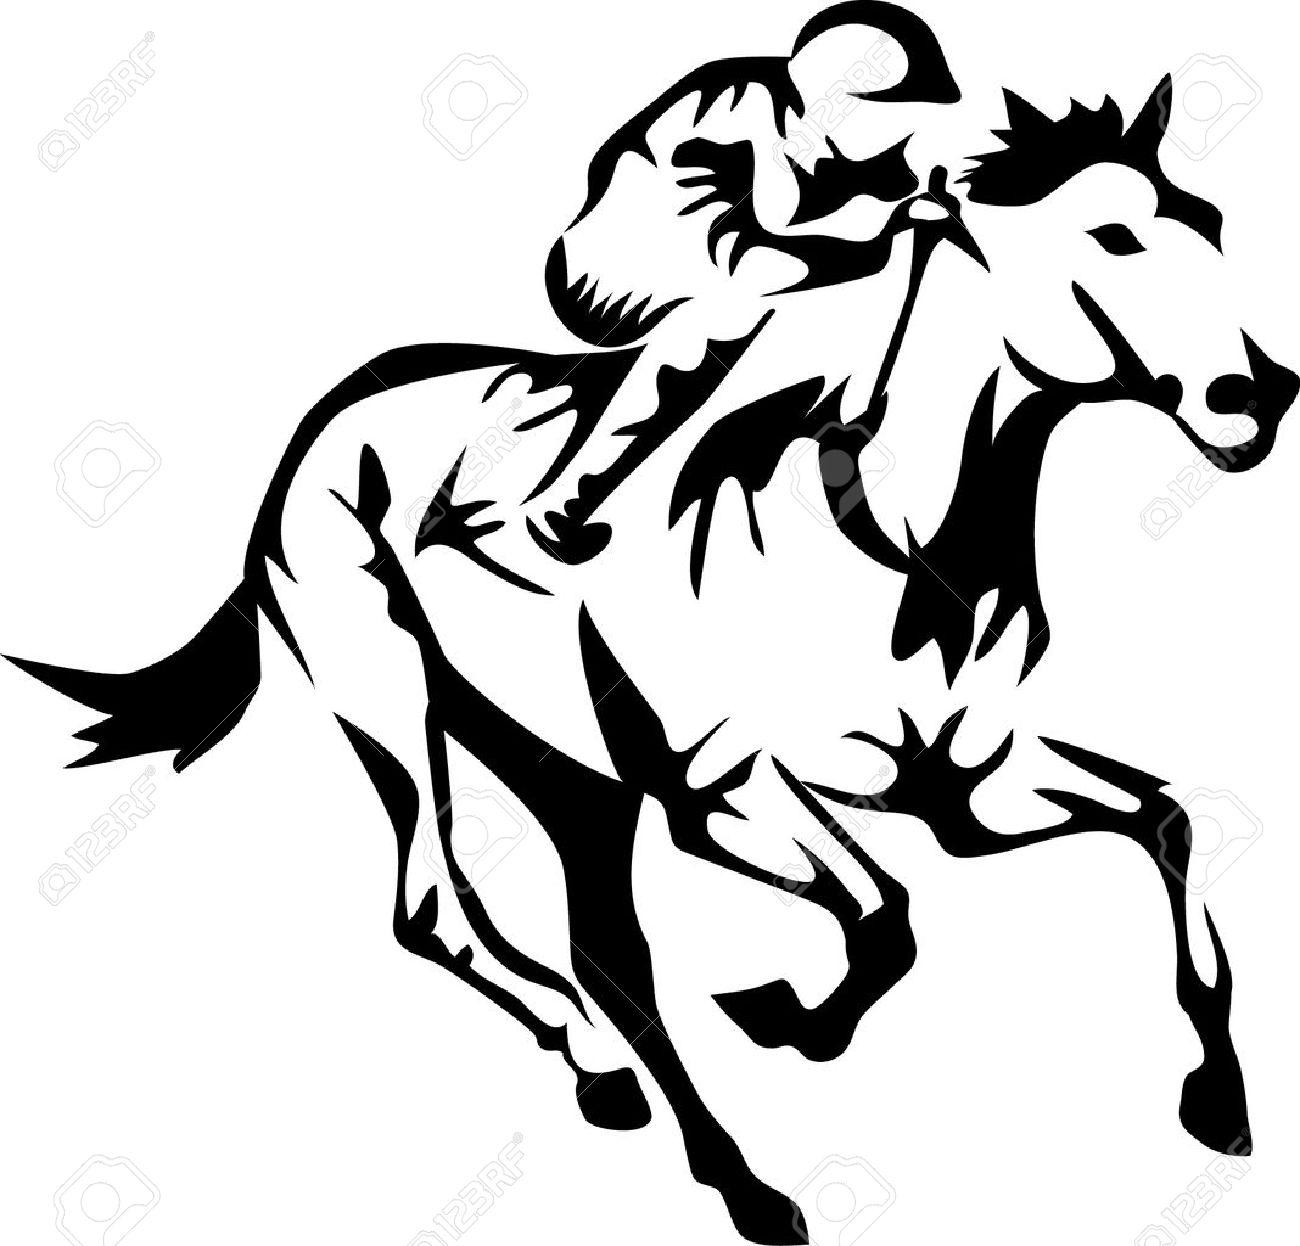 racing horse - 28879475